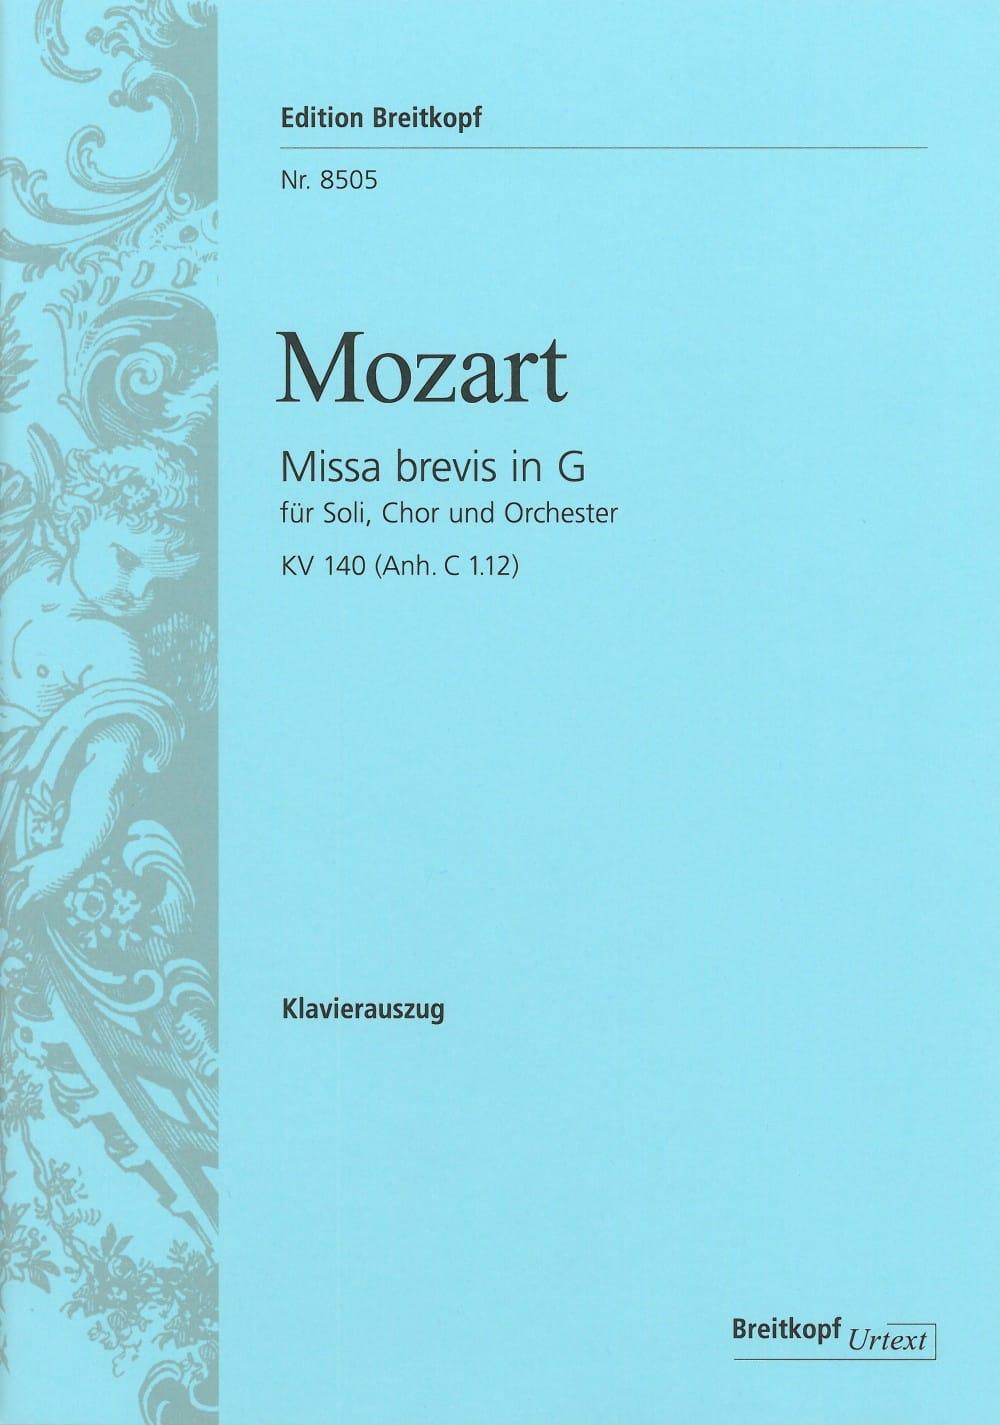 Missa Brevis in G KV 140 - MOZART - Partition - laflutedepan.com